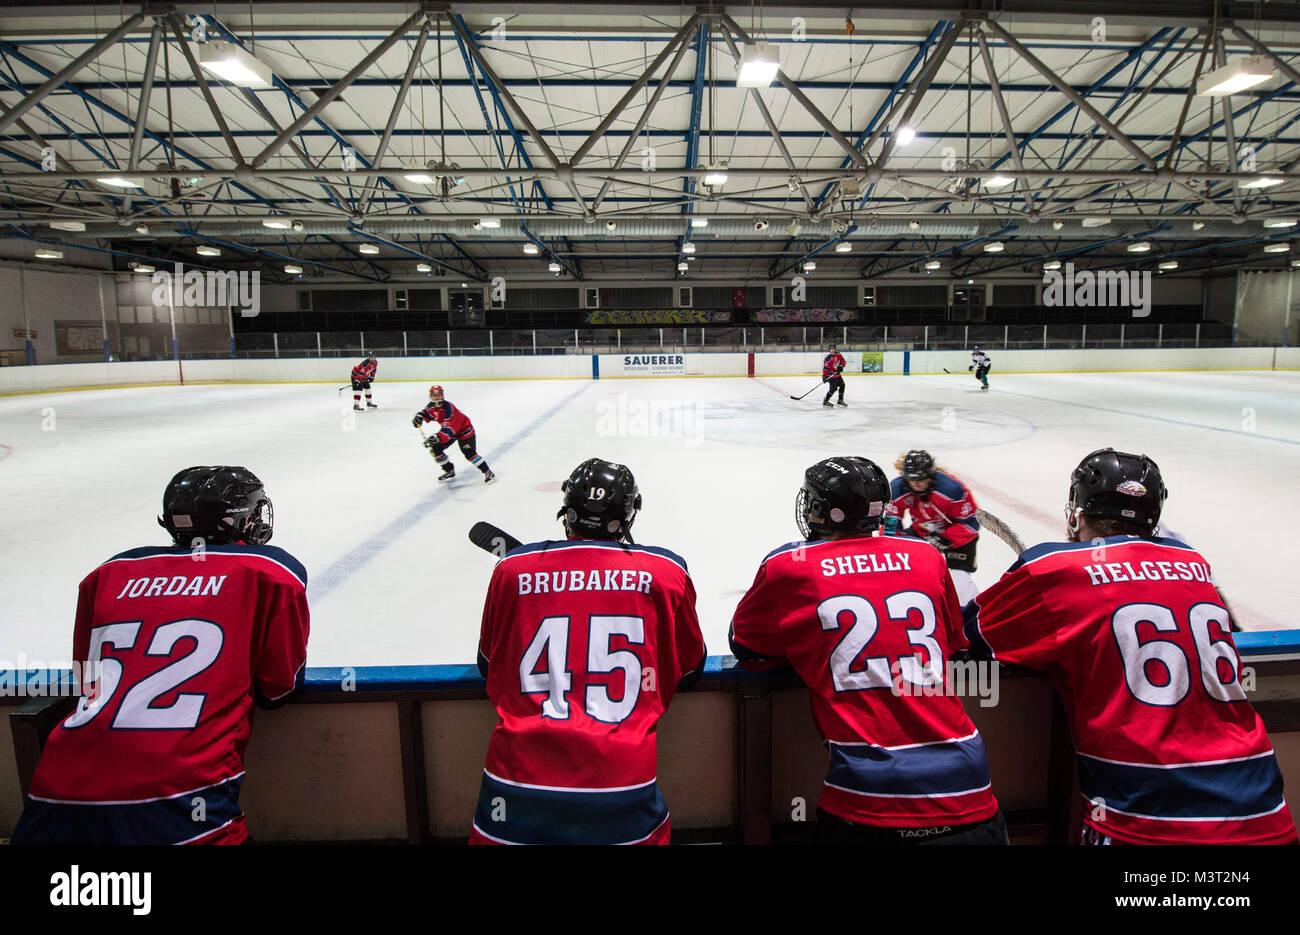 d8c965ec3 Members of the Kaiserslautern Military Community Eagles Hockey Team wait  their turn to practice on the ice rink sideline in Zweibrucken